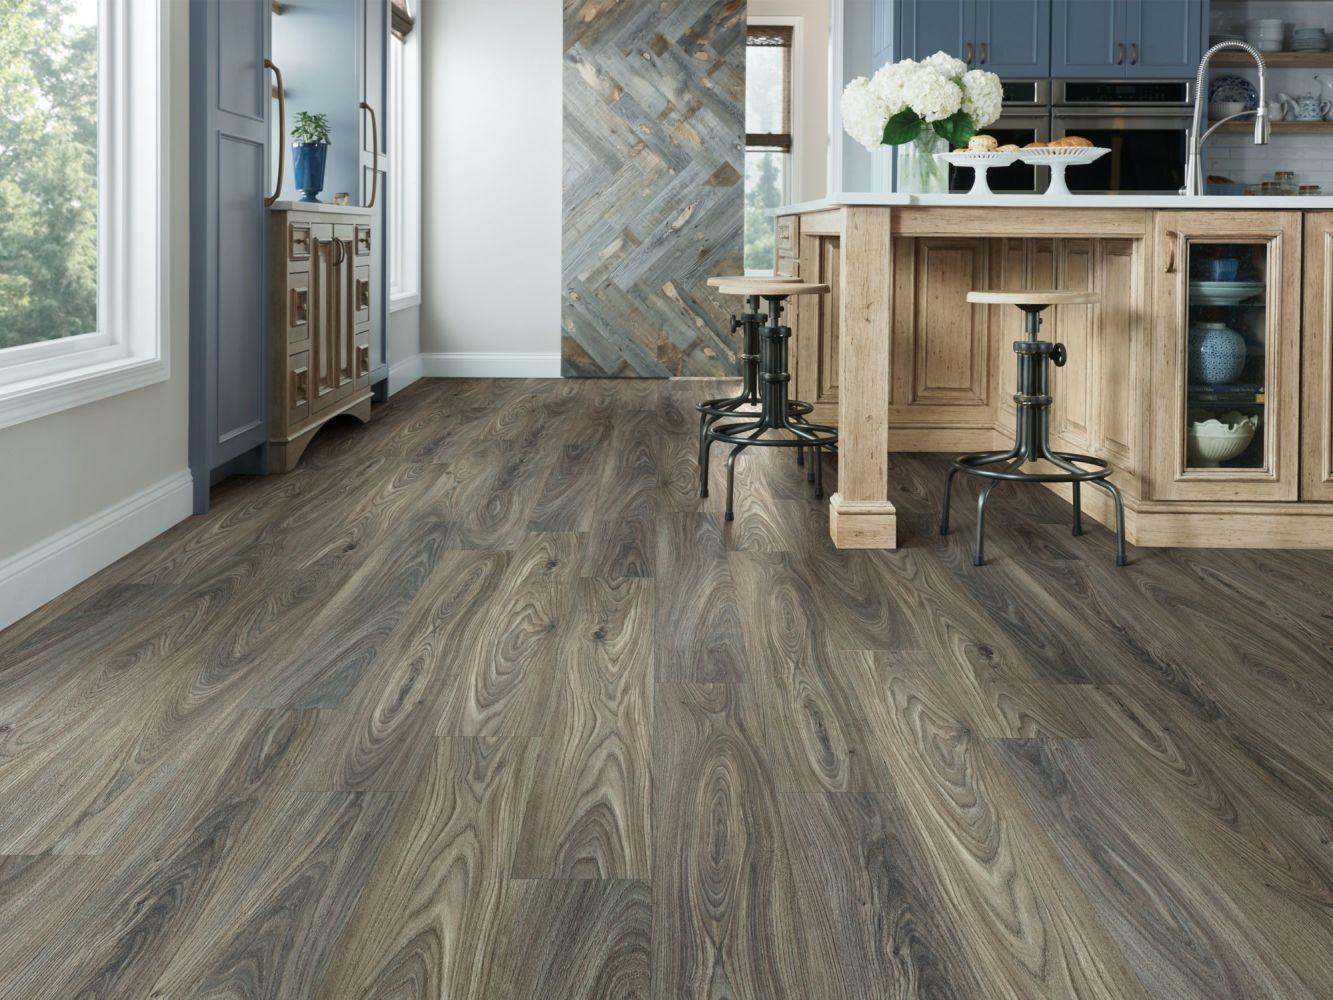 Shaw Floors Resilient Property Solutions Brio Plus Dark Elm 00915_VE285